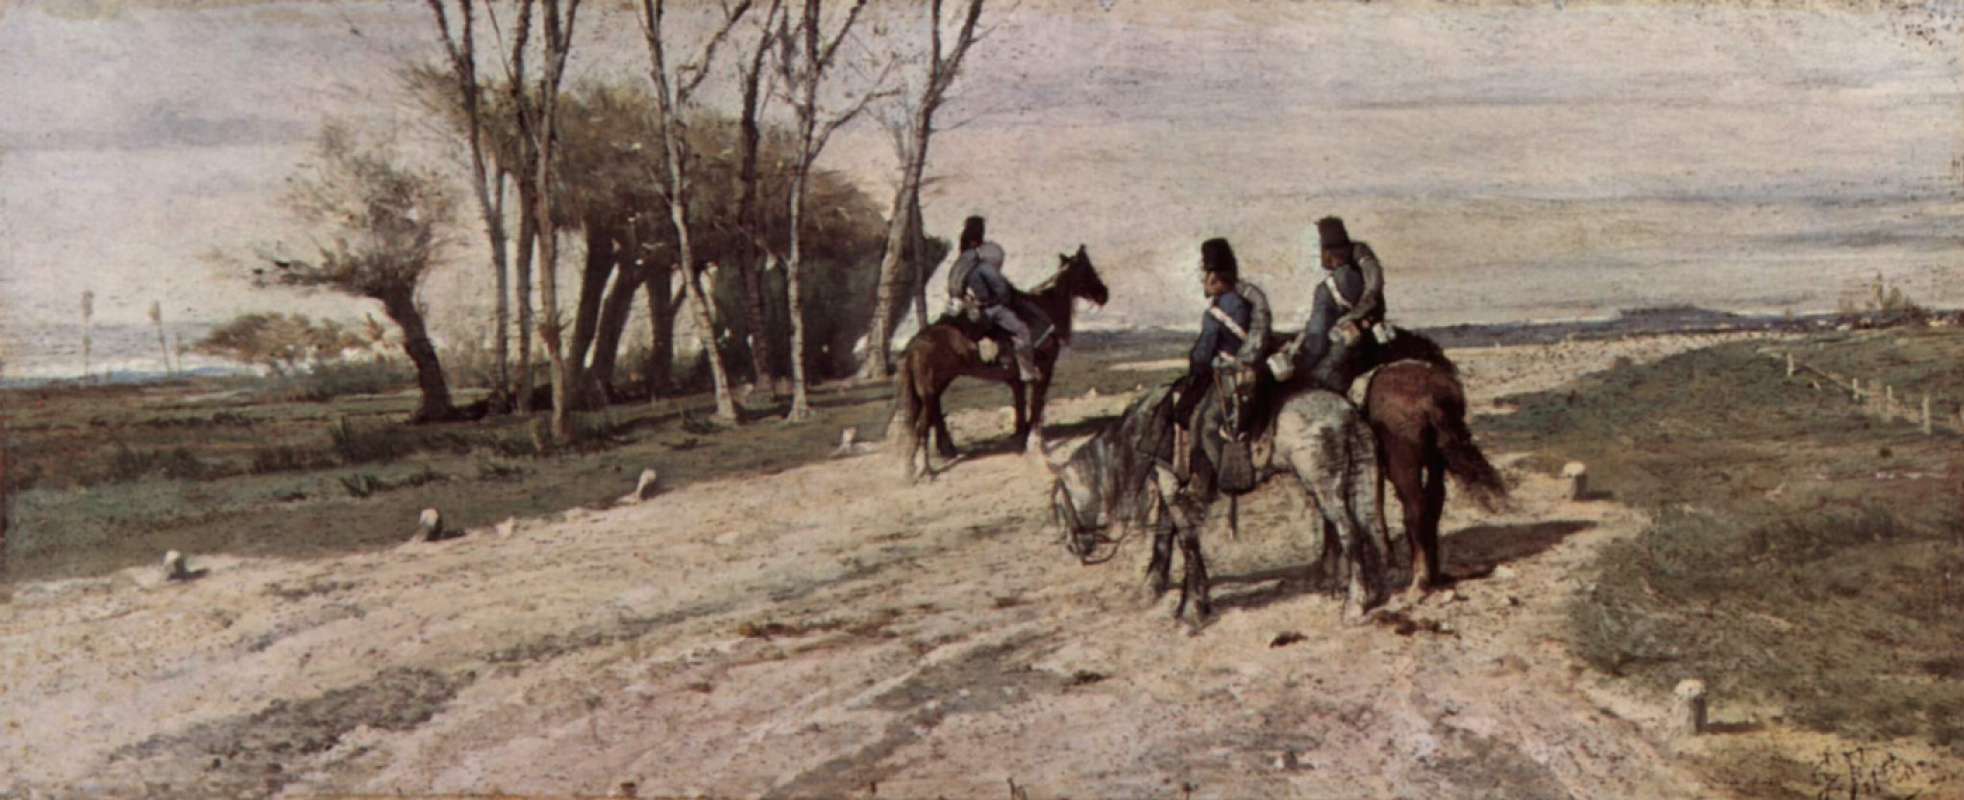 Джованни Фаттори. Три кавалериста на дороге